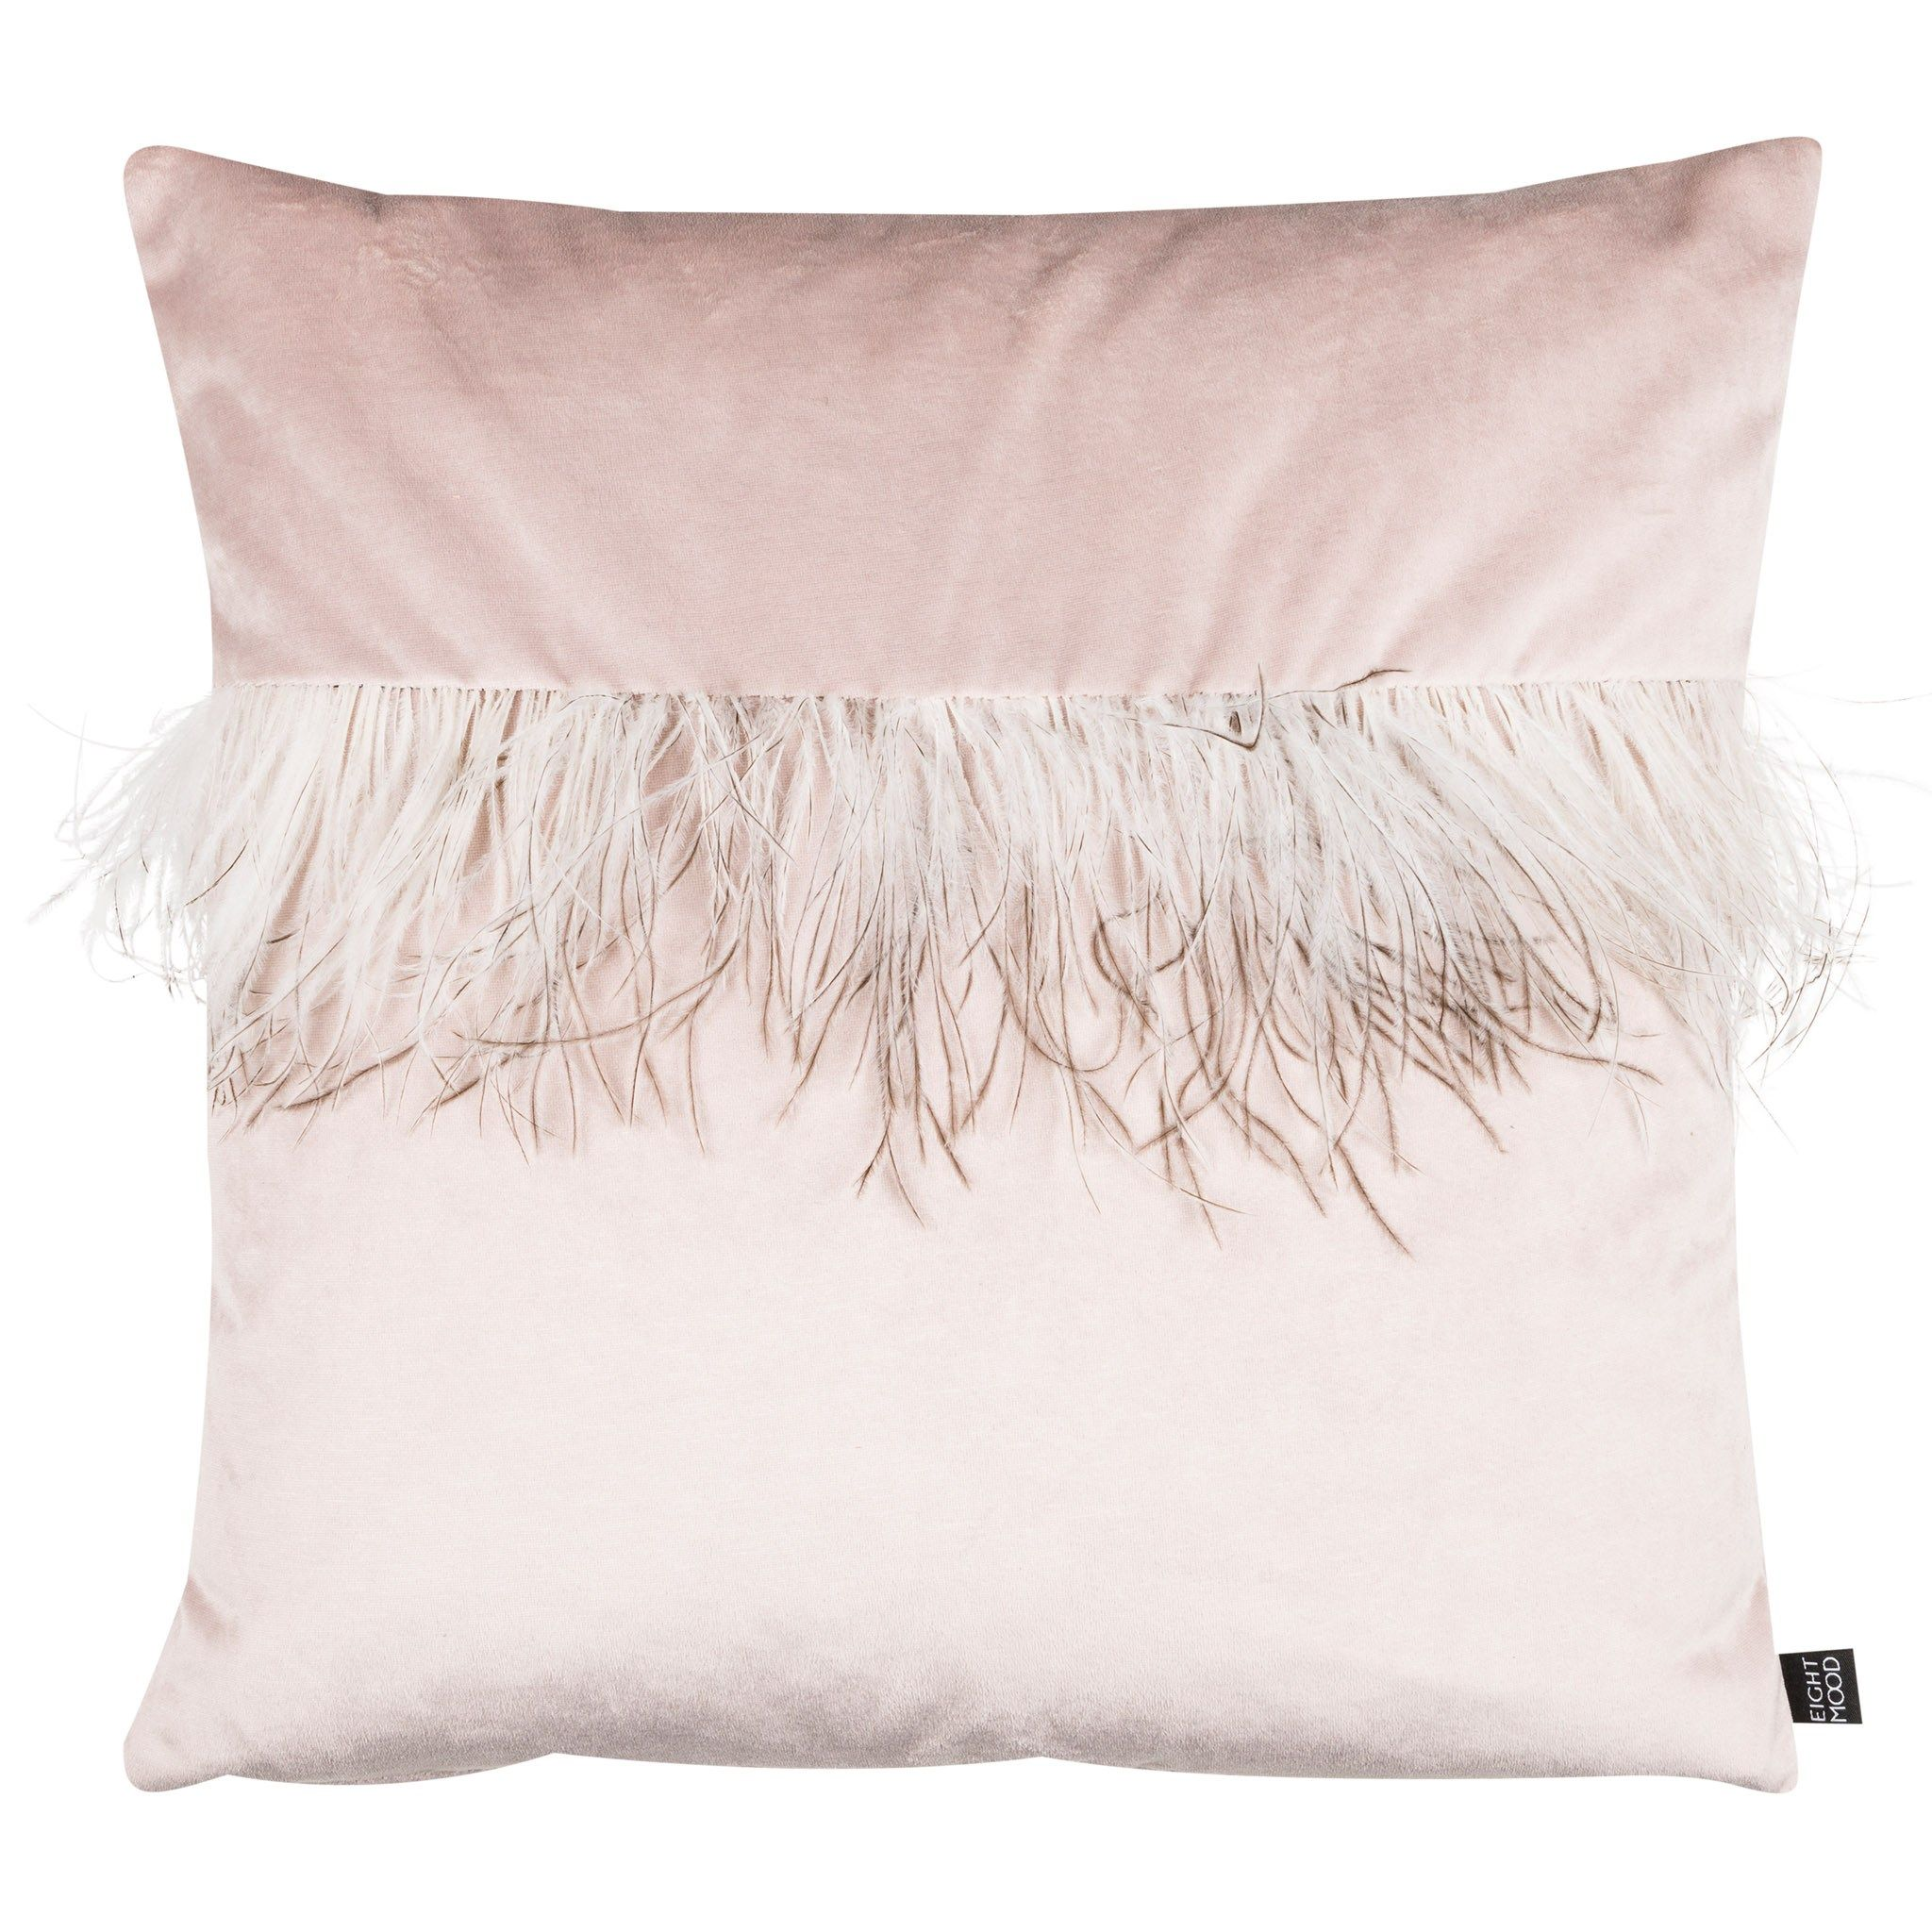 Swedish Interiordesign: Joselyn Feather Pillow, Light Pink. Shop